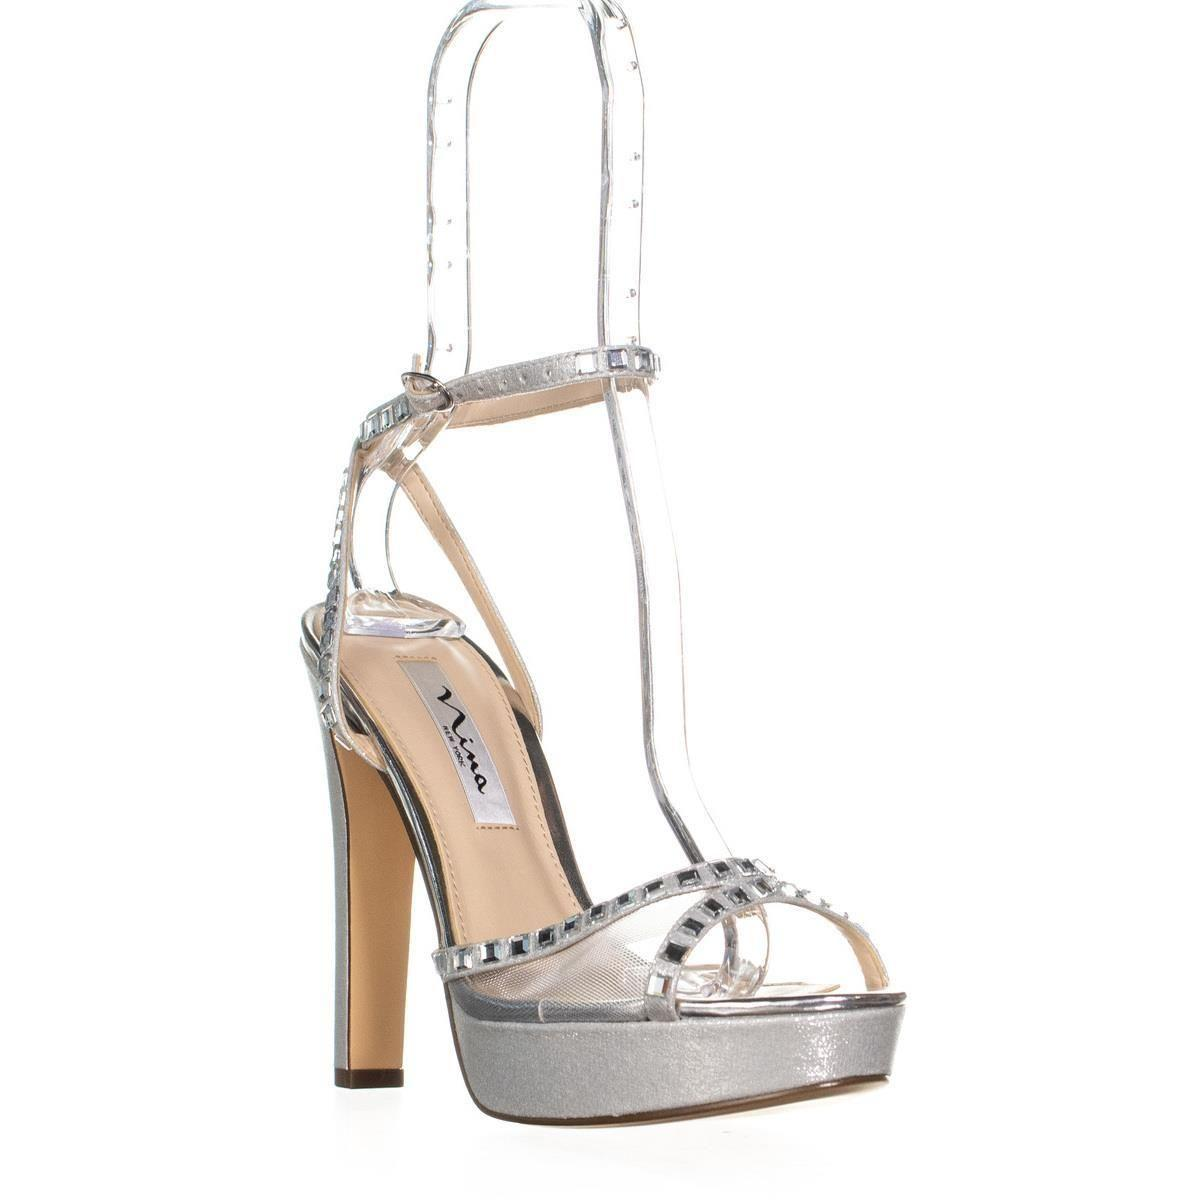 9fe4f24a8ae Lyst - Nina Myrna Platform Ankle Strap Dress Sandals in Metallic ...